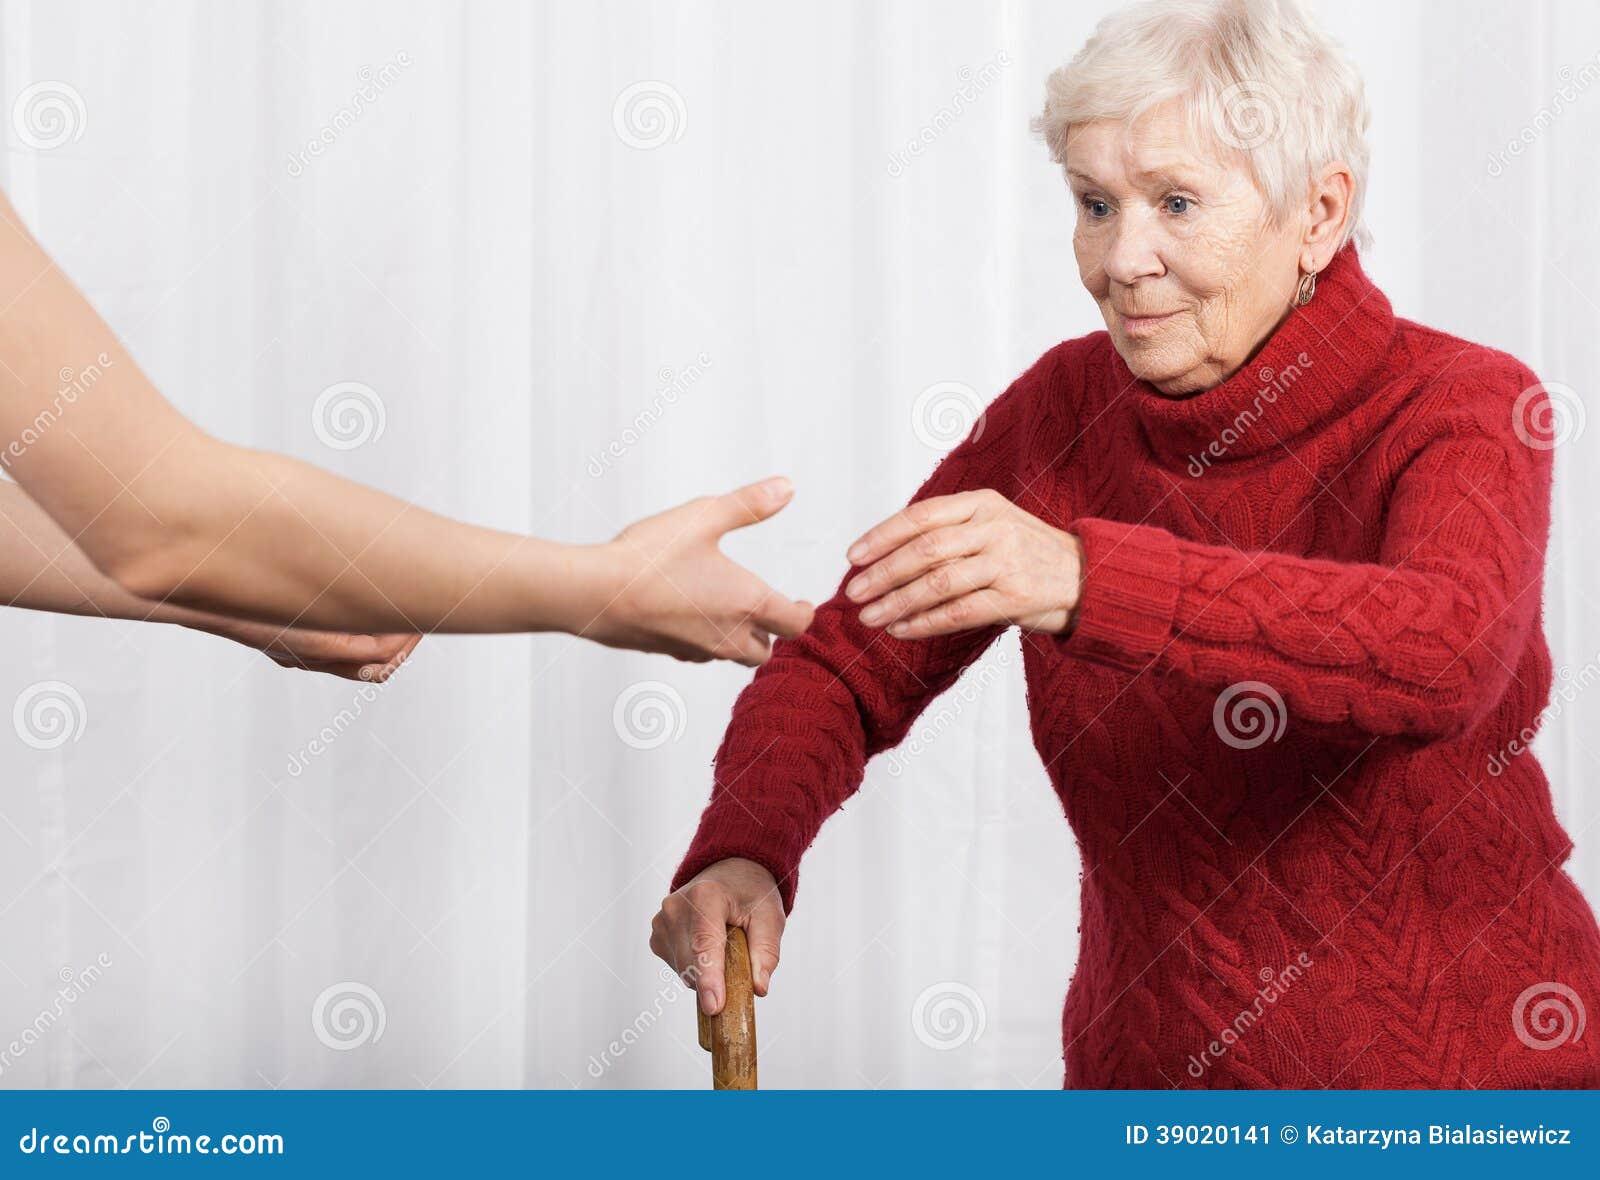 Elderly woman trying to walk